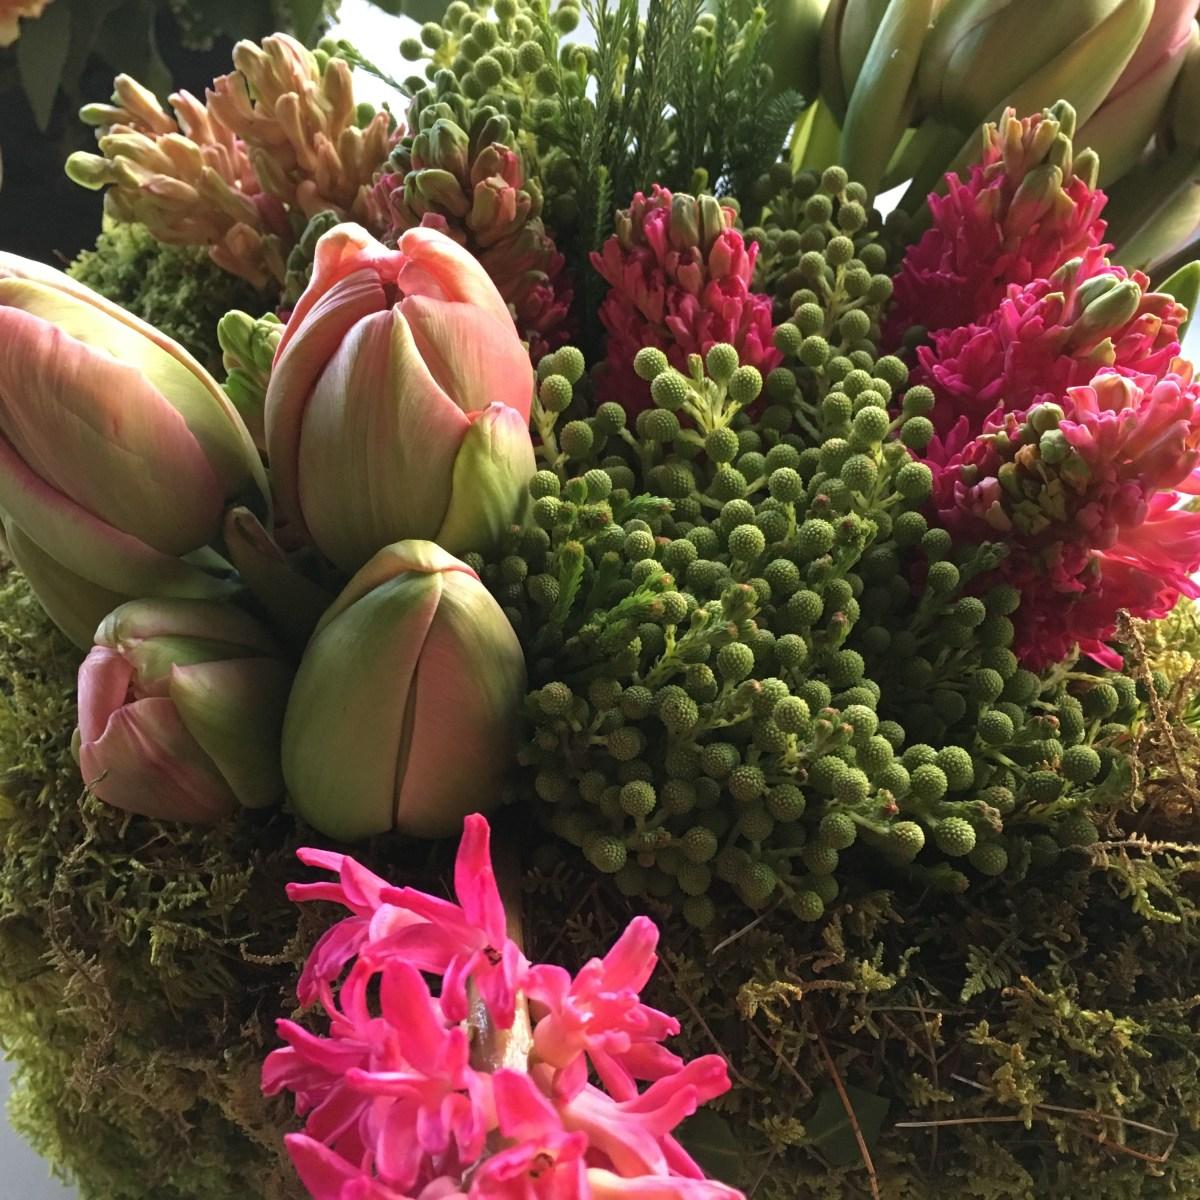 floral-cindye-spring-dinner-party-11